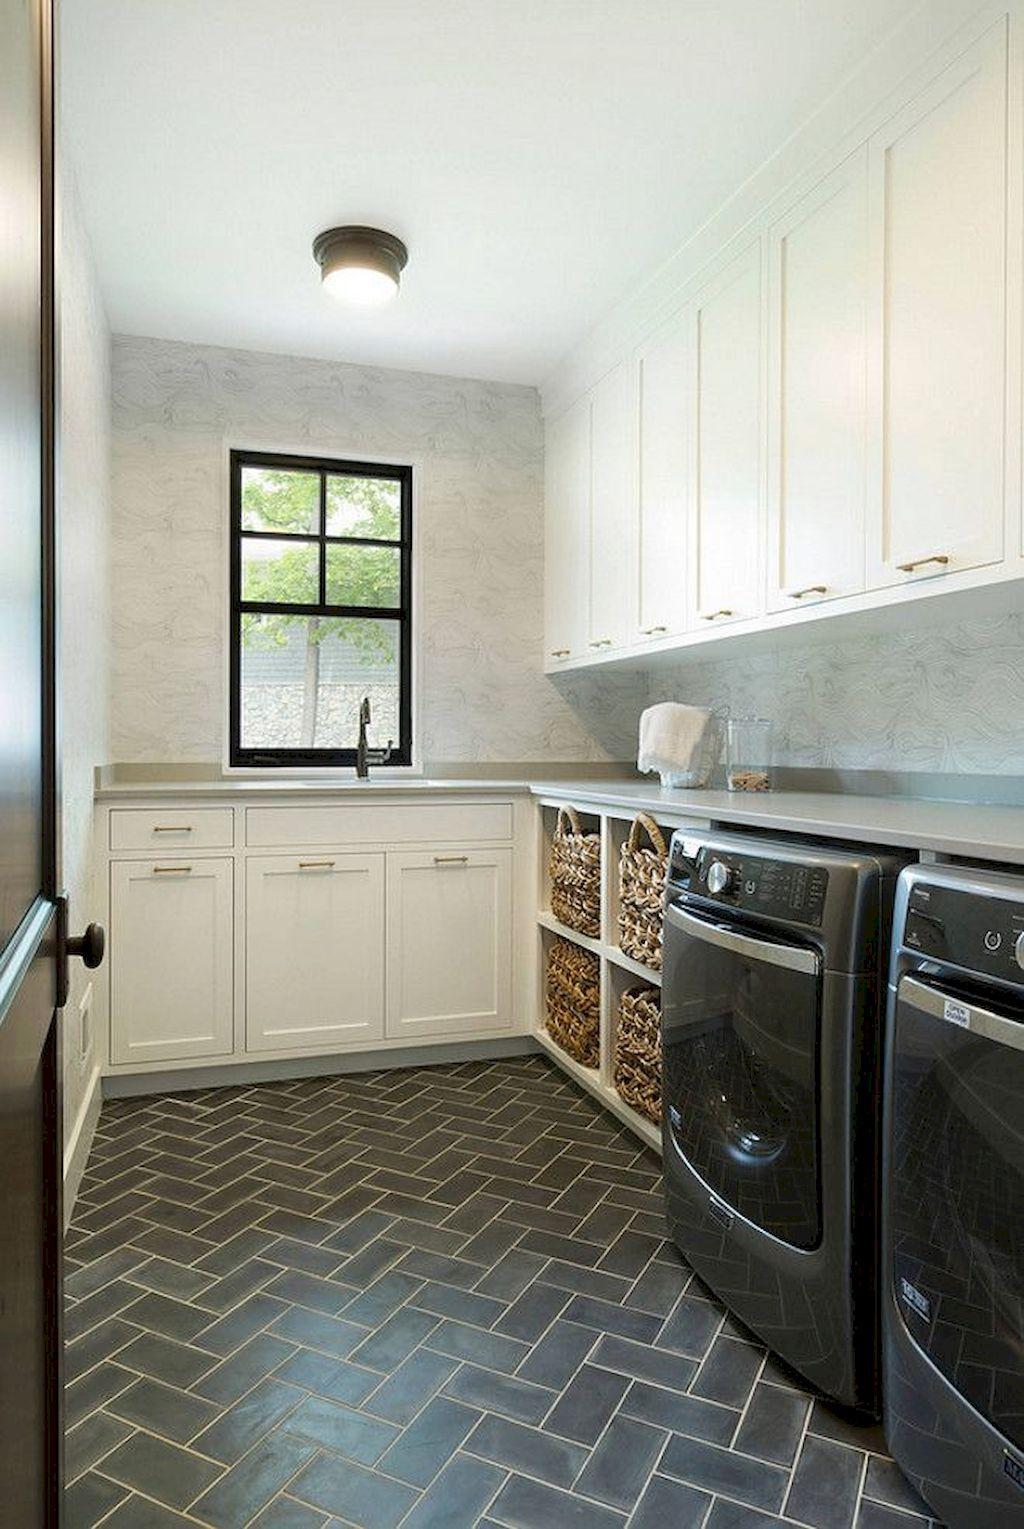 80 Genius Small Laundry Room Decor Ideas images